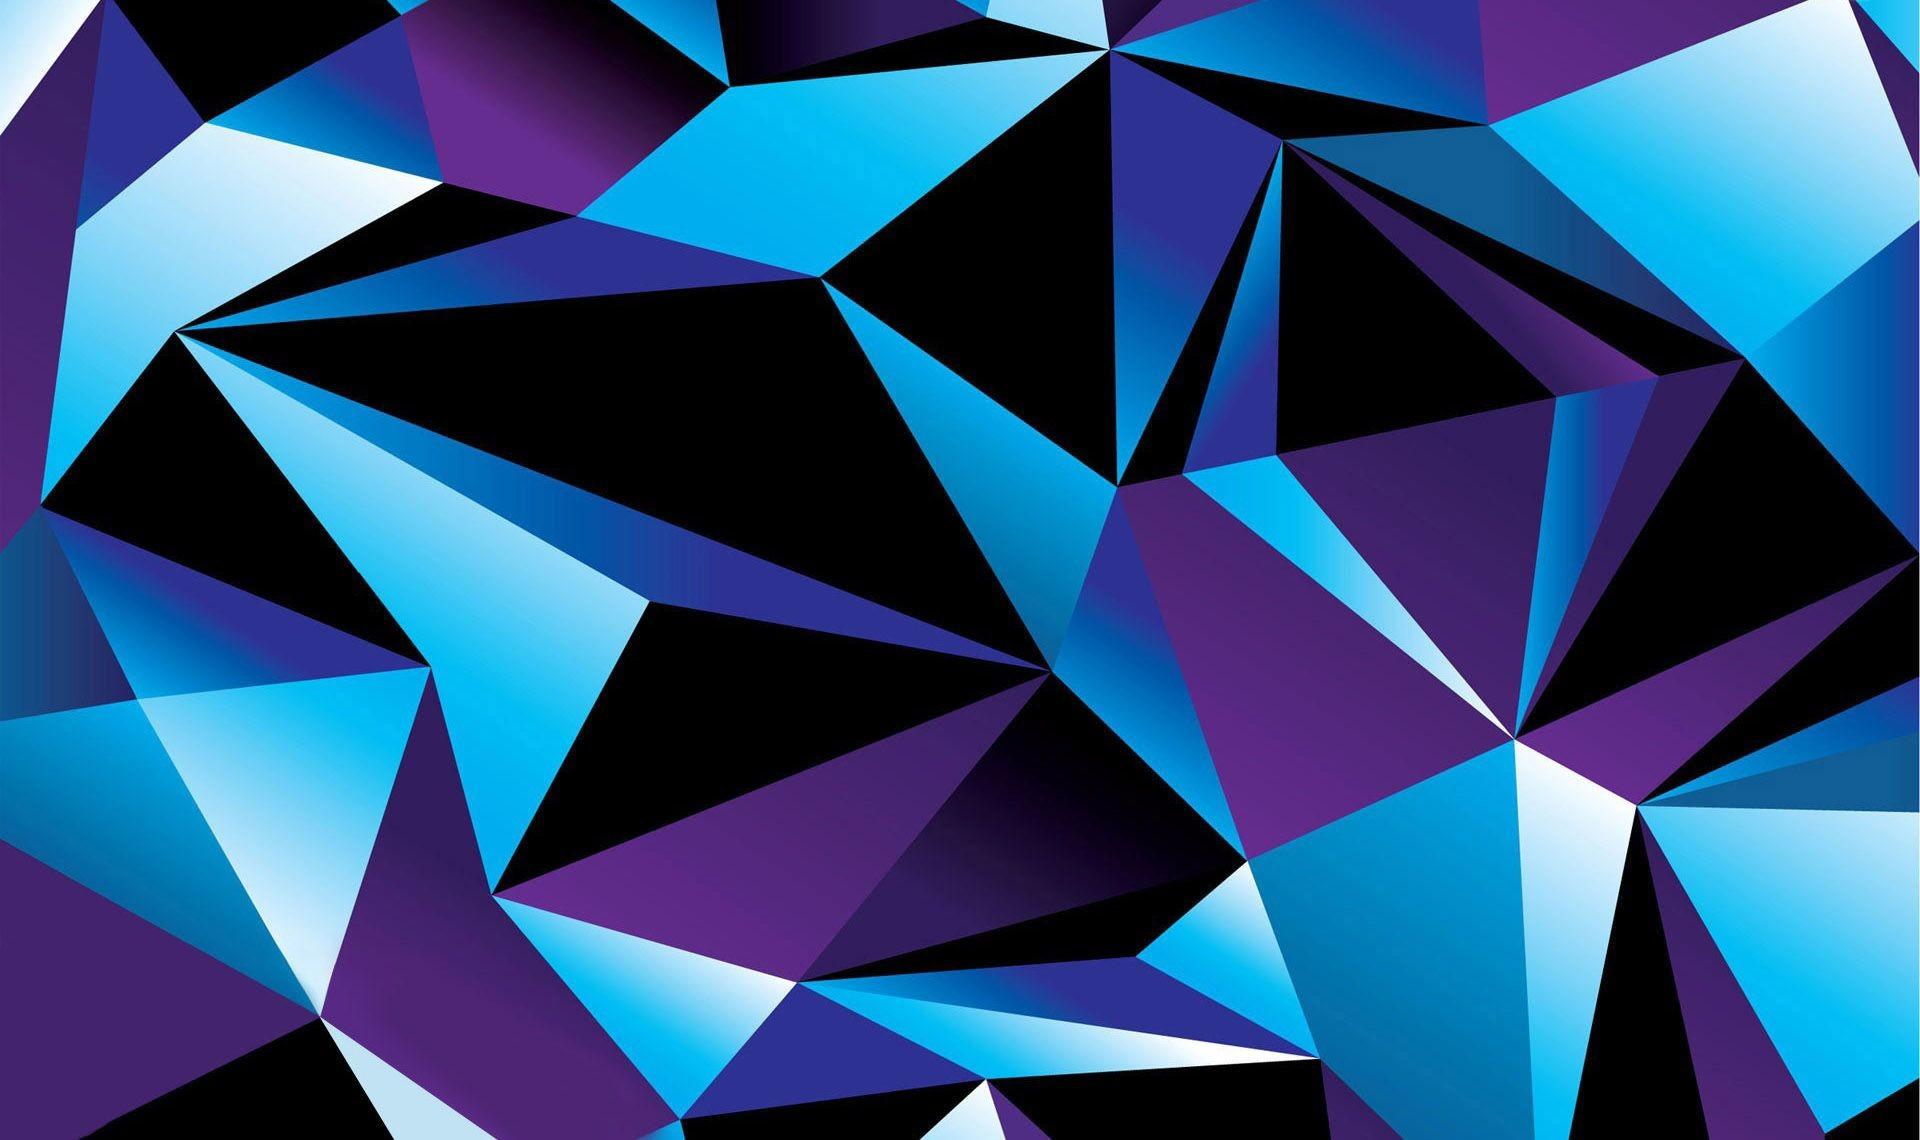 Res: 1920x1140, Blue Diamond Pattern Wallpaper